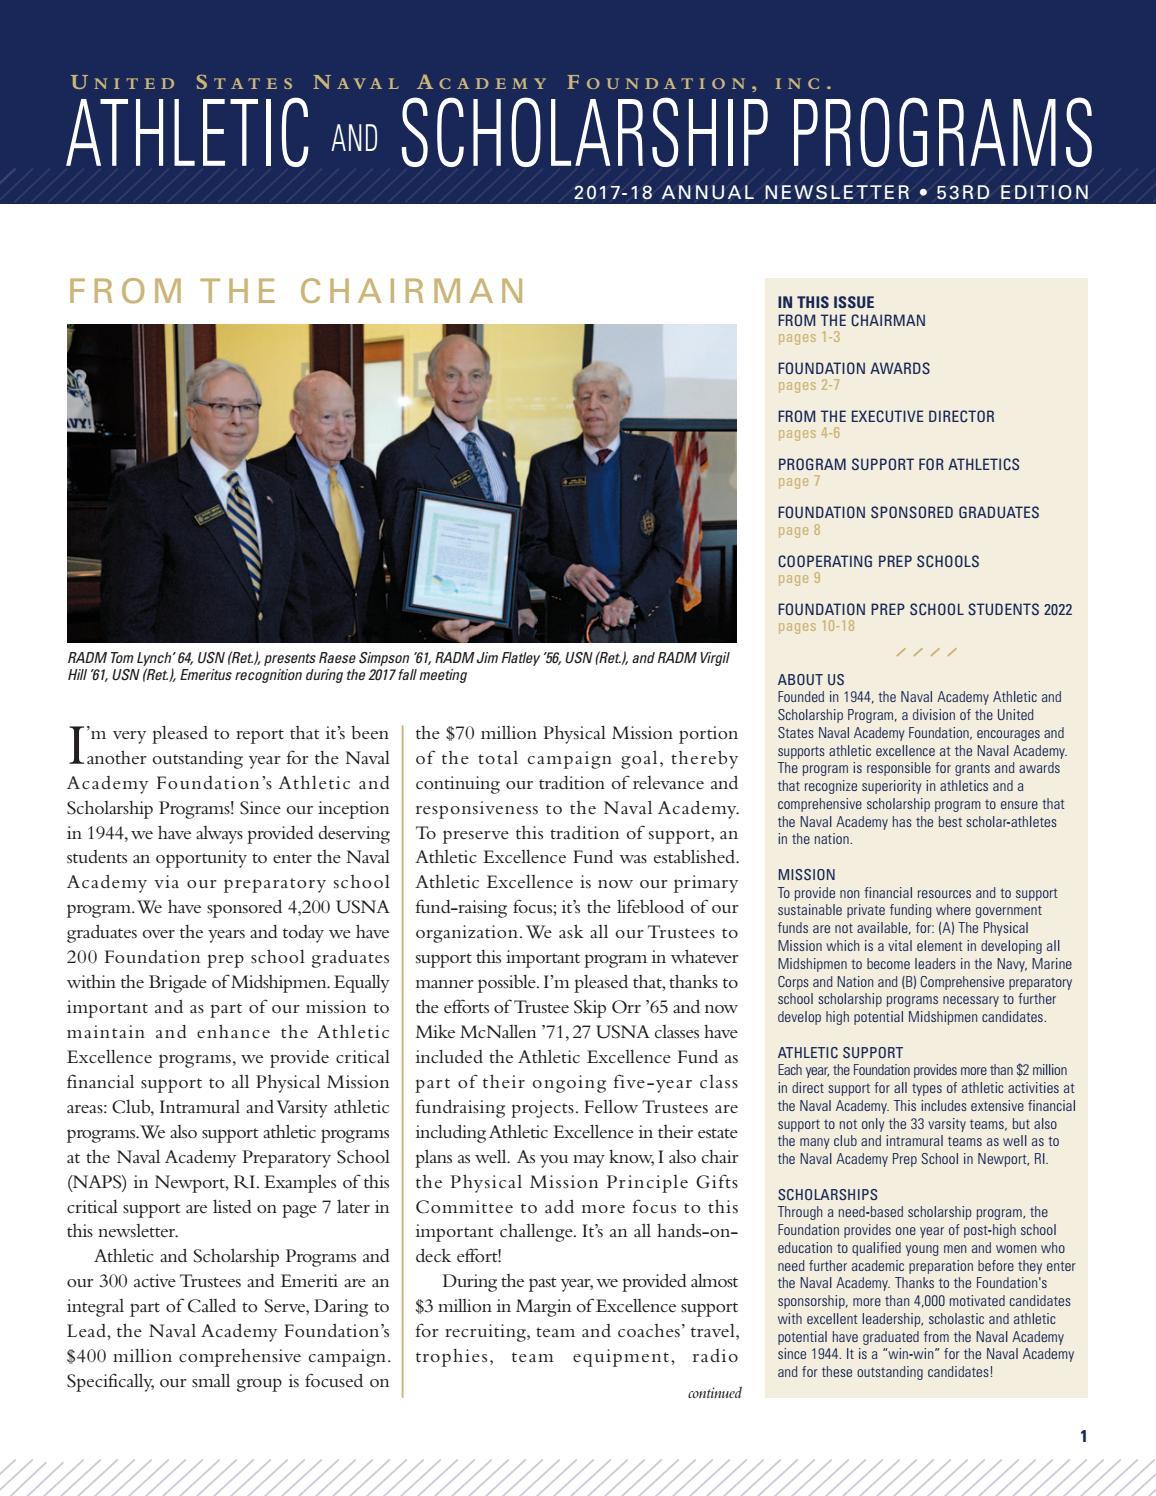 U S  Naval Academy Foundation Athletic & Scholarship